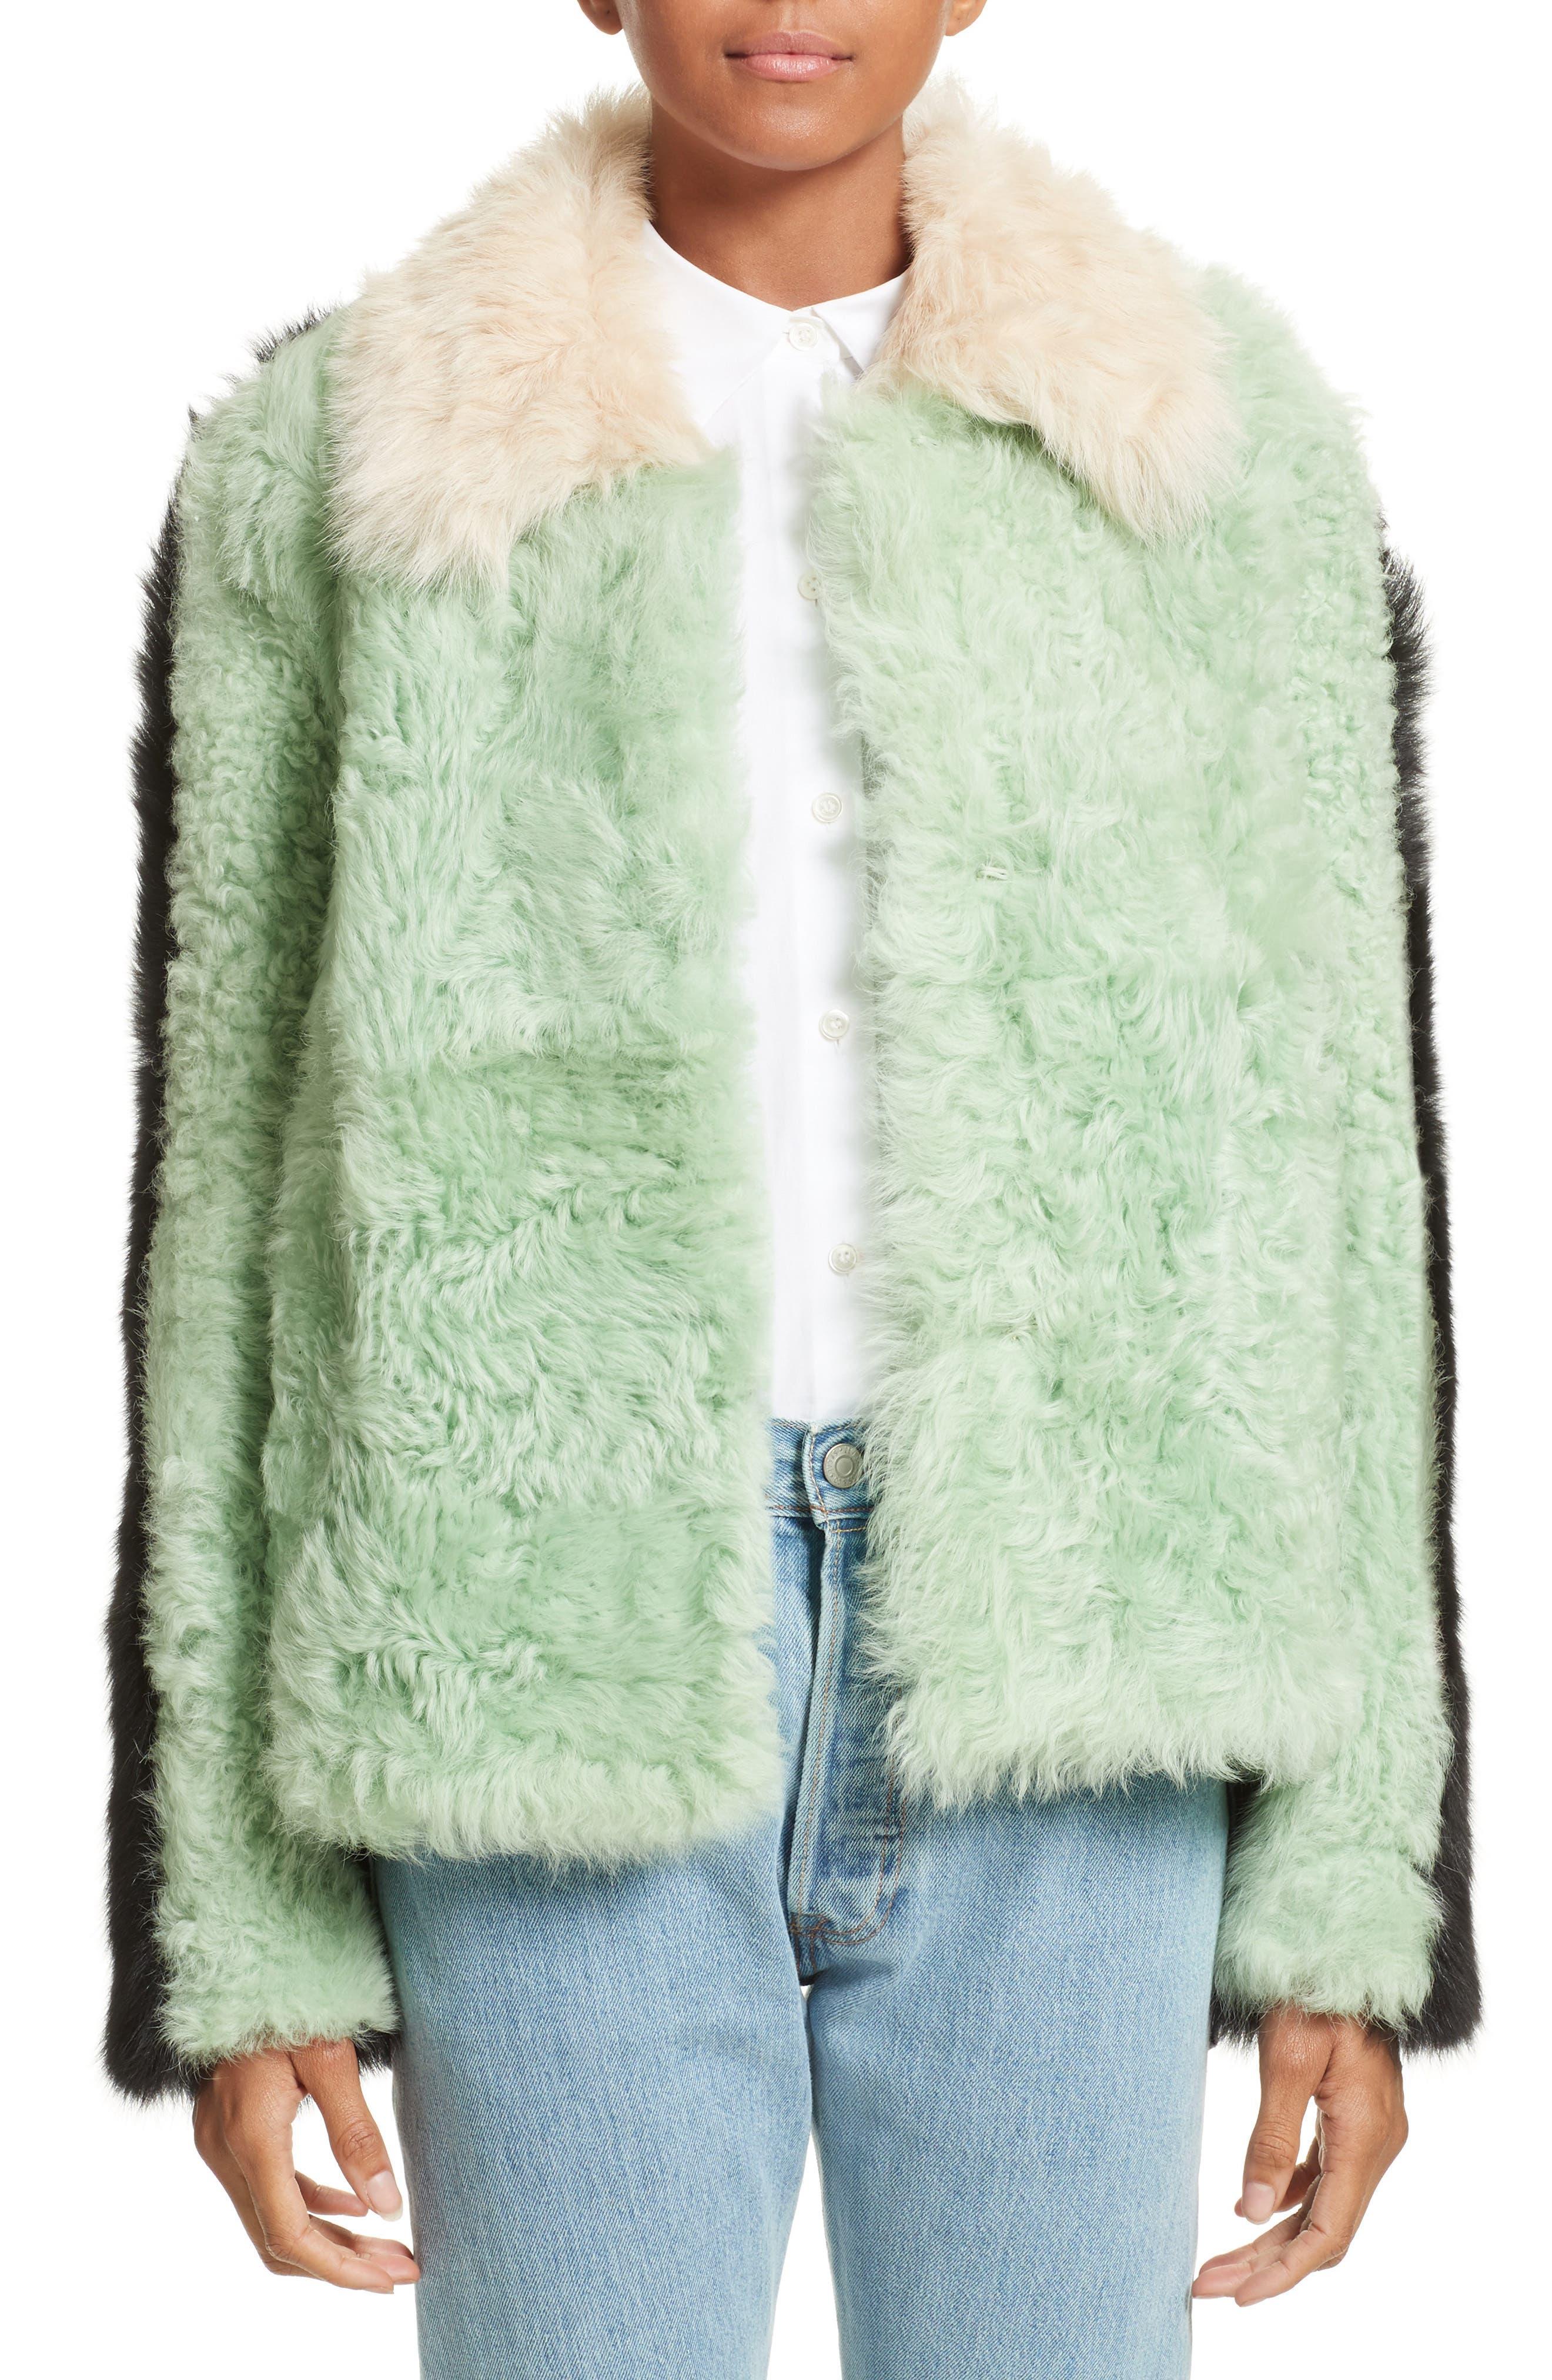 Cashew Genuine Shearling Coat,                             Main thumbnail 1, color,